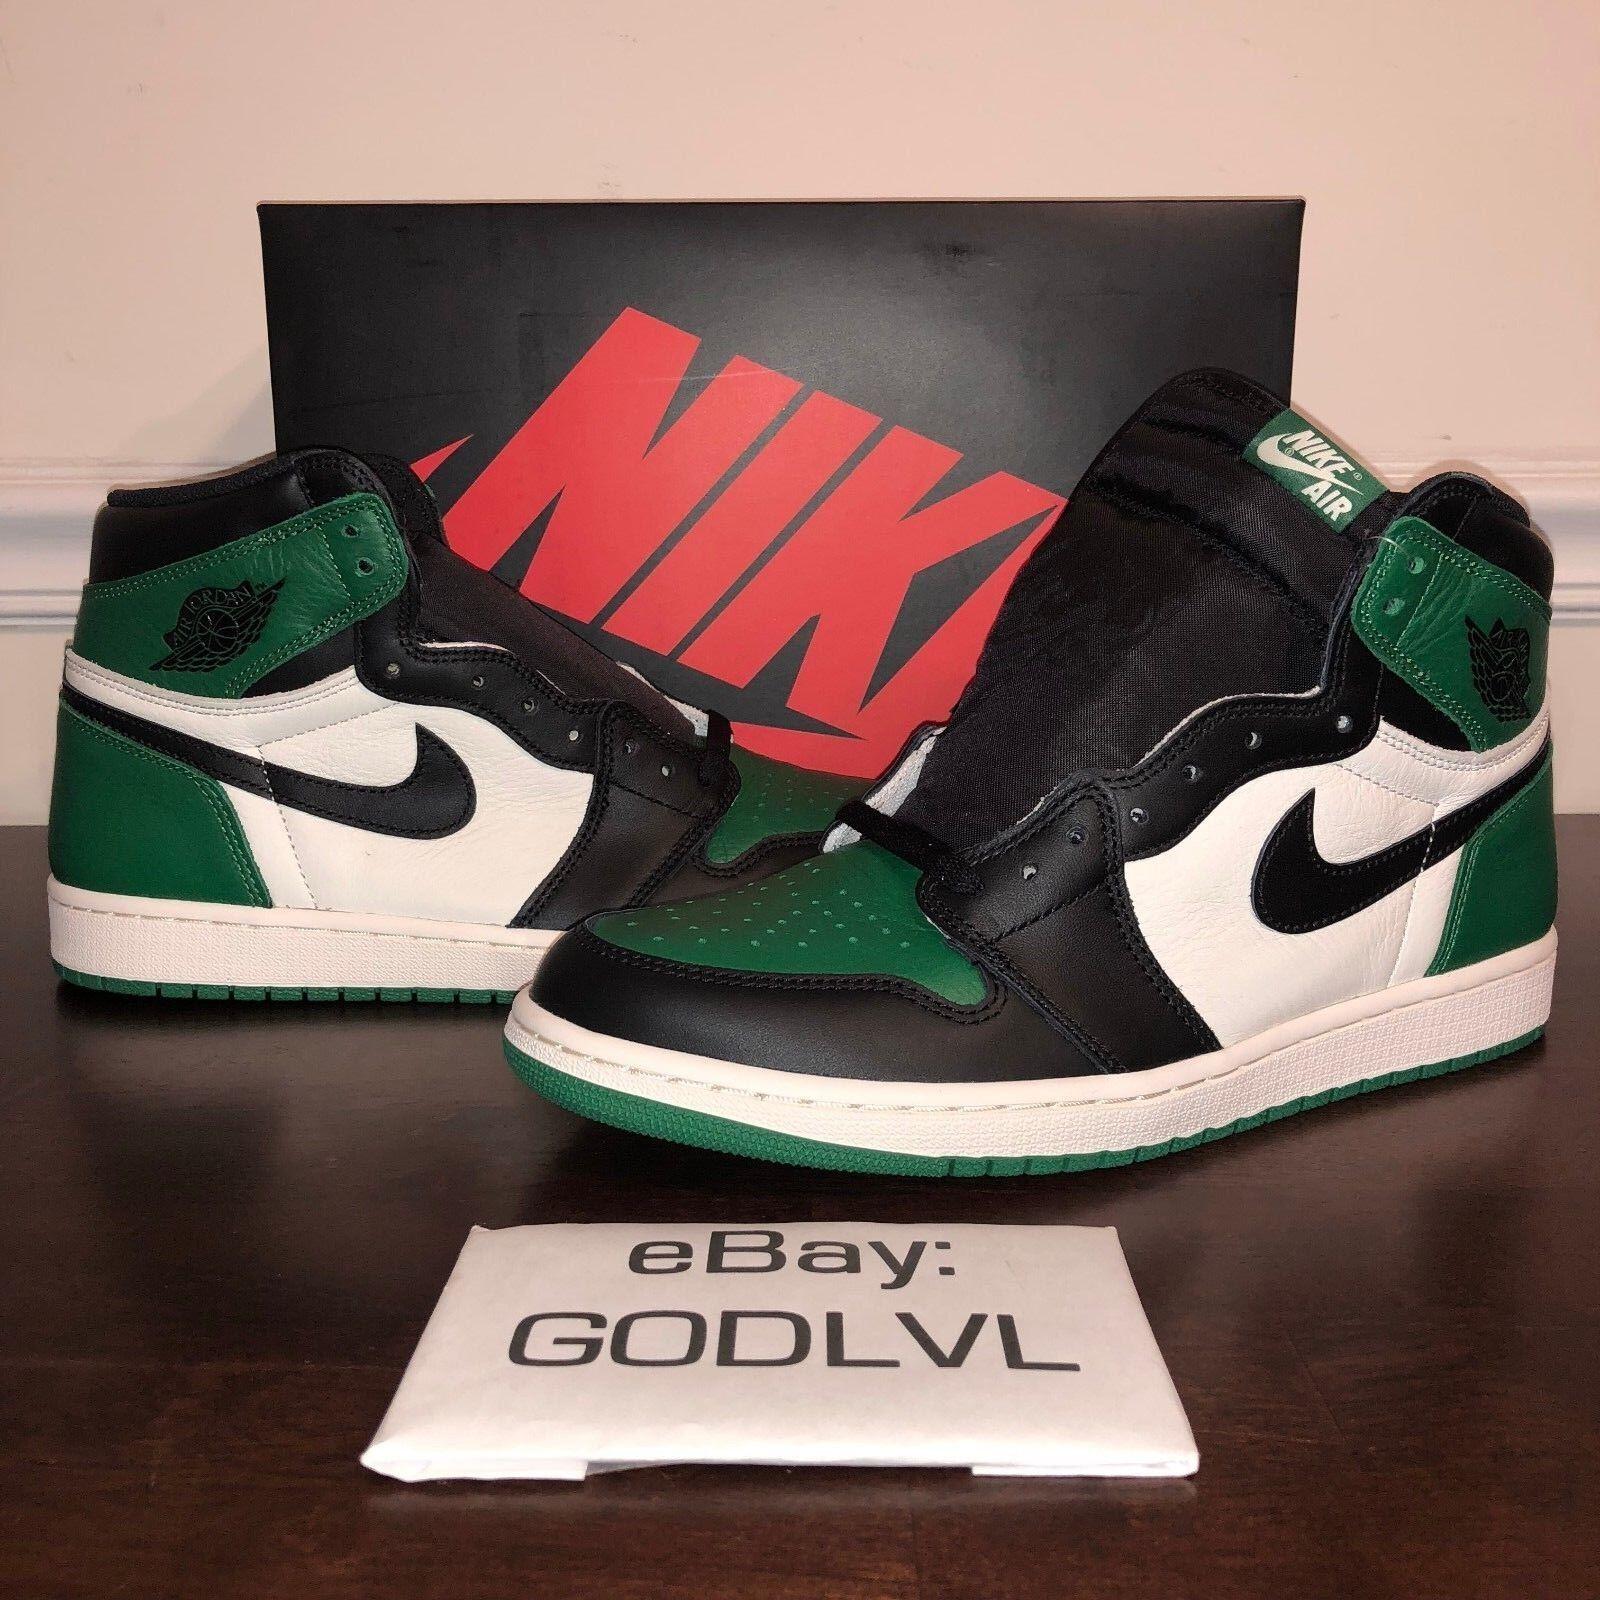 Air Jordan Retro 1 OG High Pine Green 555088-302 Size 11 11.5 12